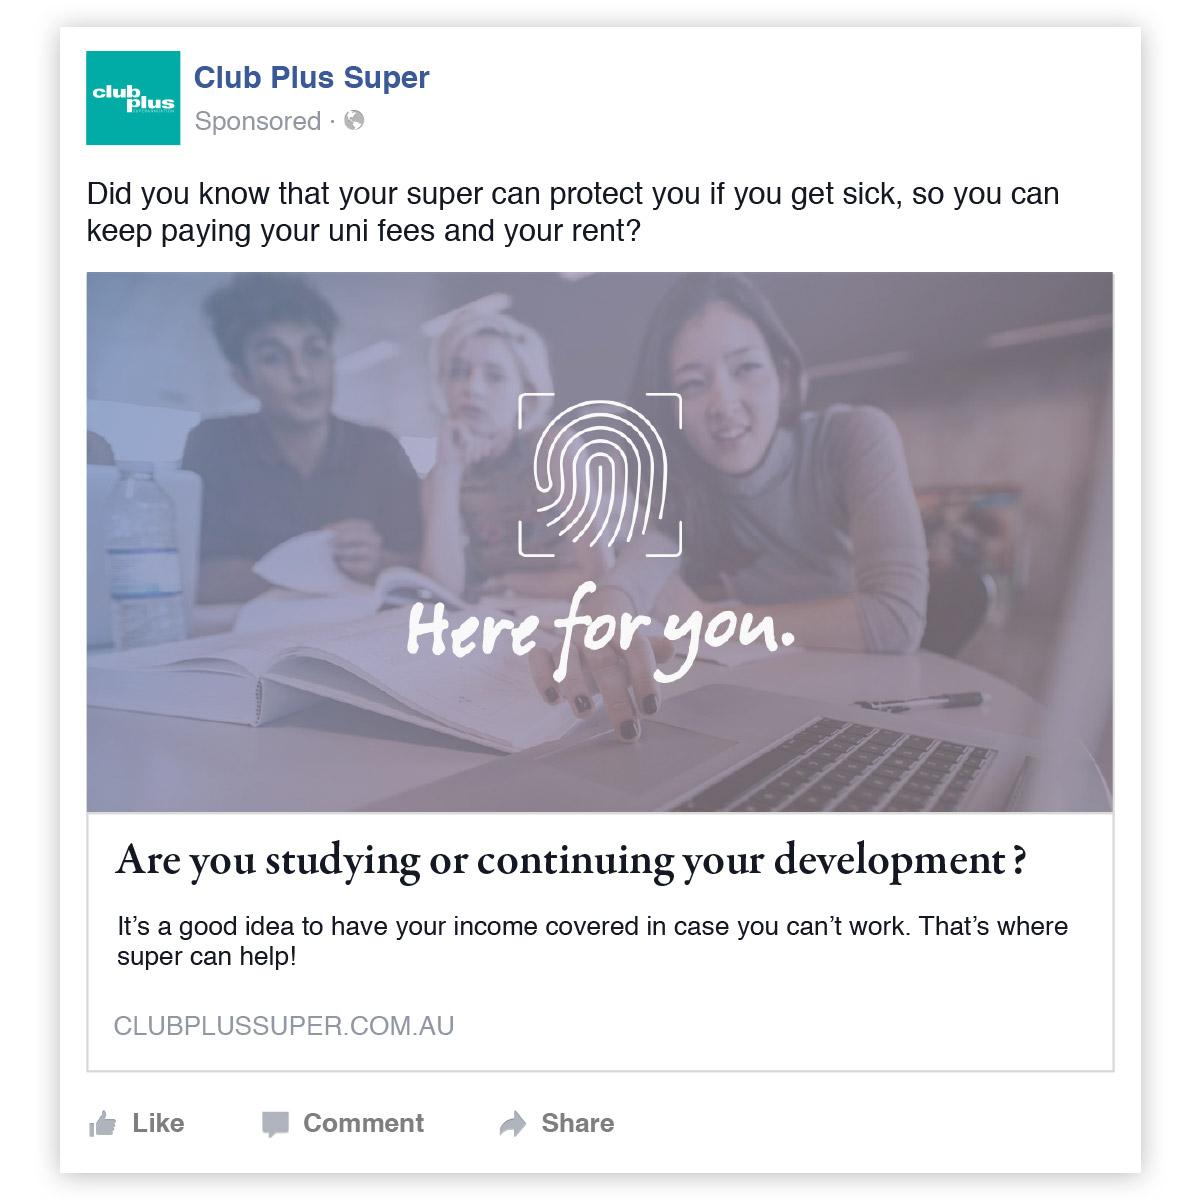 CPS-social-advertising-3.jpg